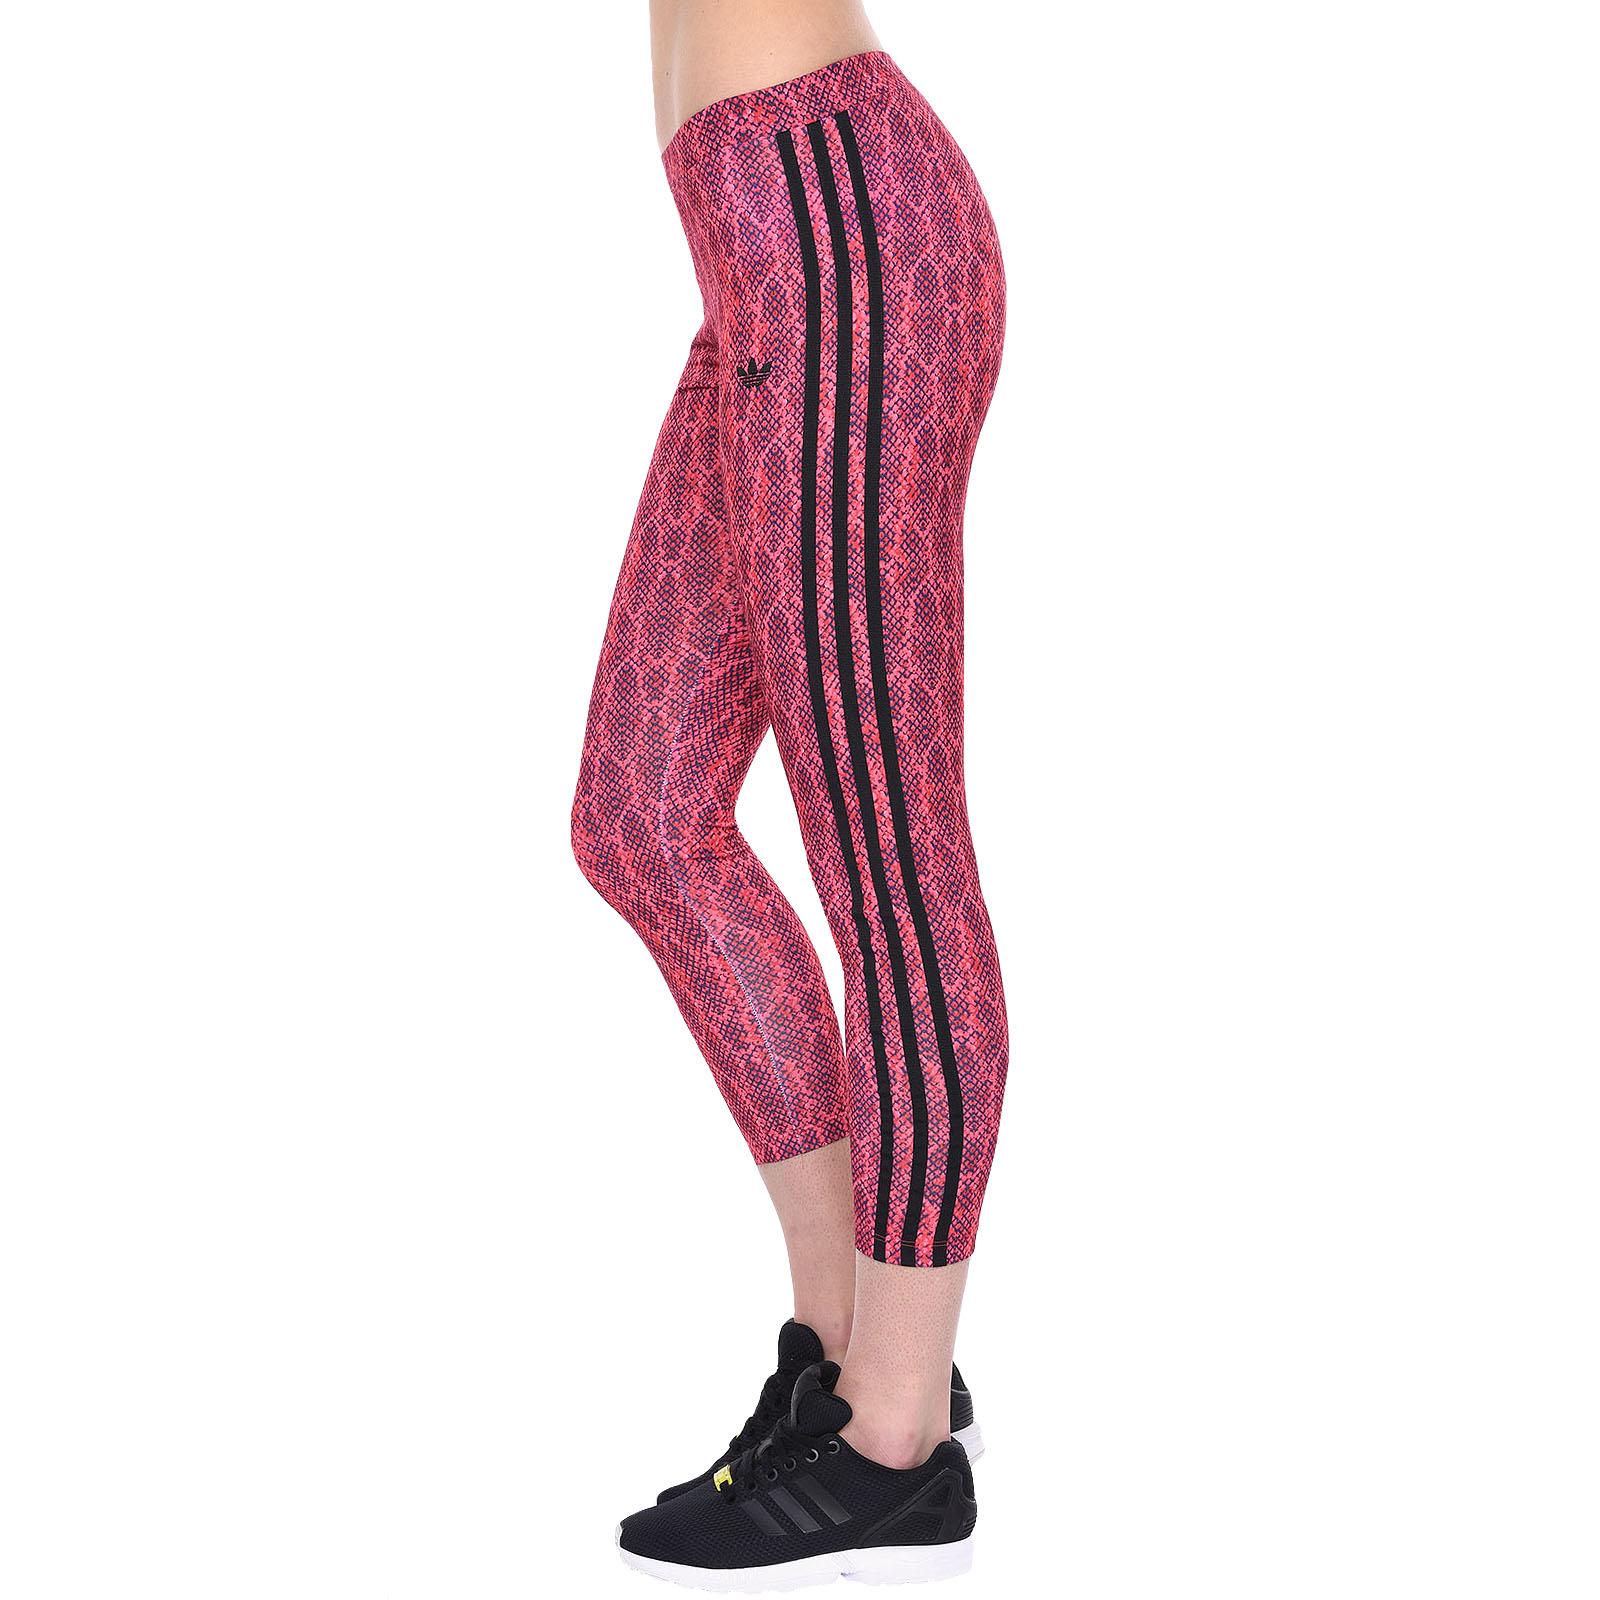 51f28d5bcaaae adidas Originals Womens Soccer Print Leggings Gym Tight Pants | eBay